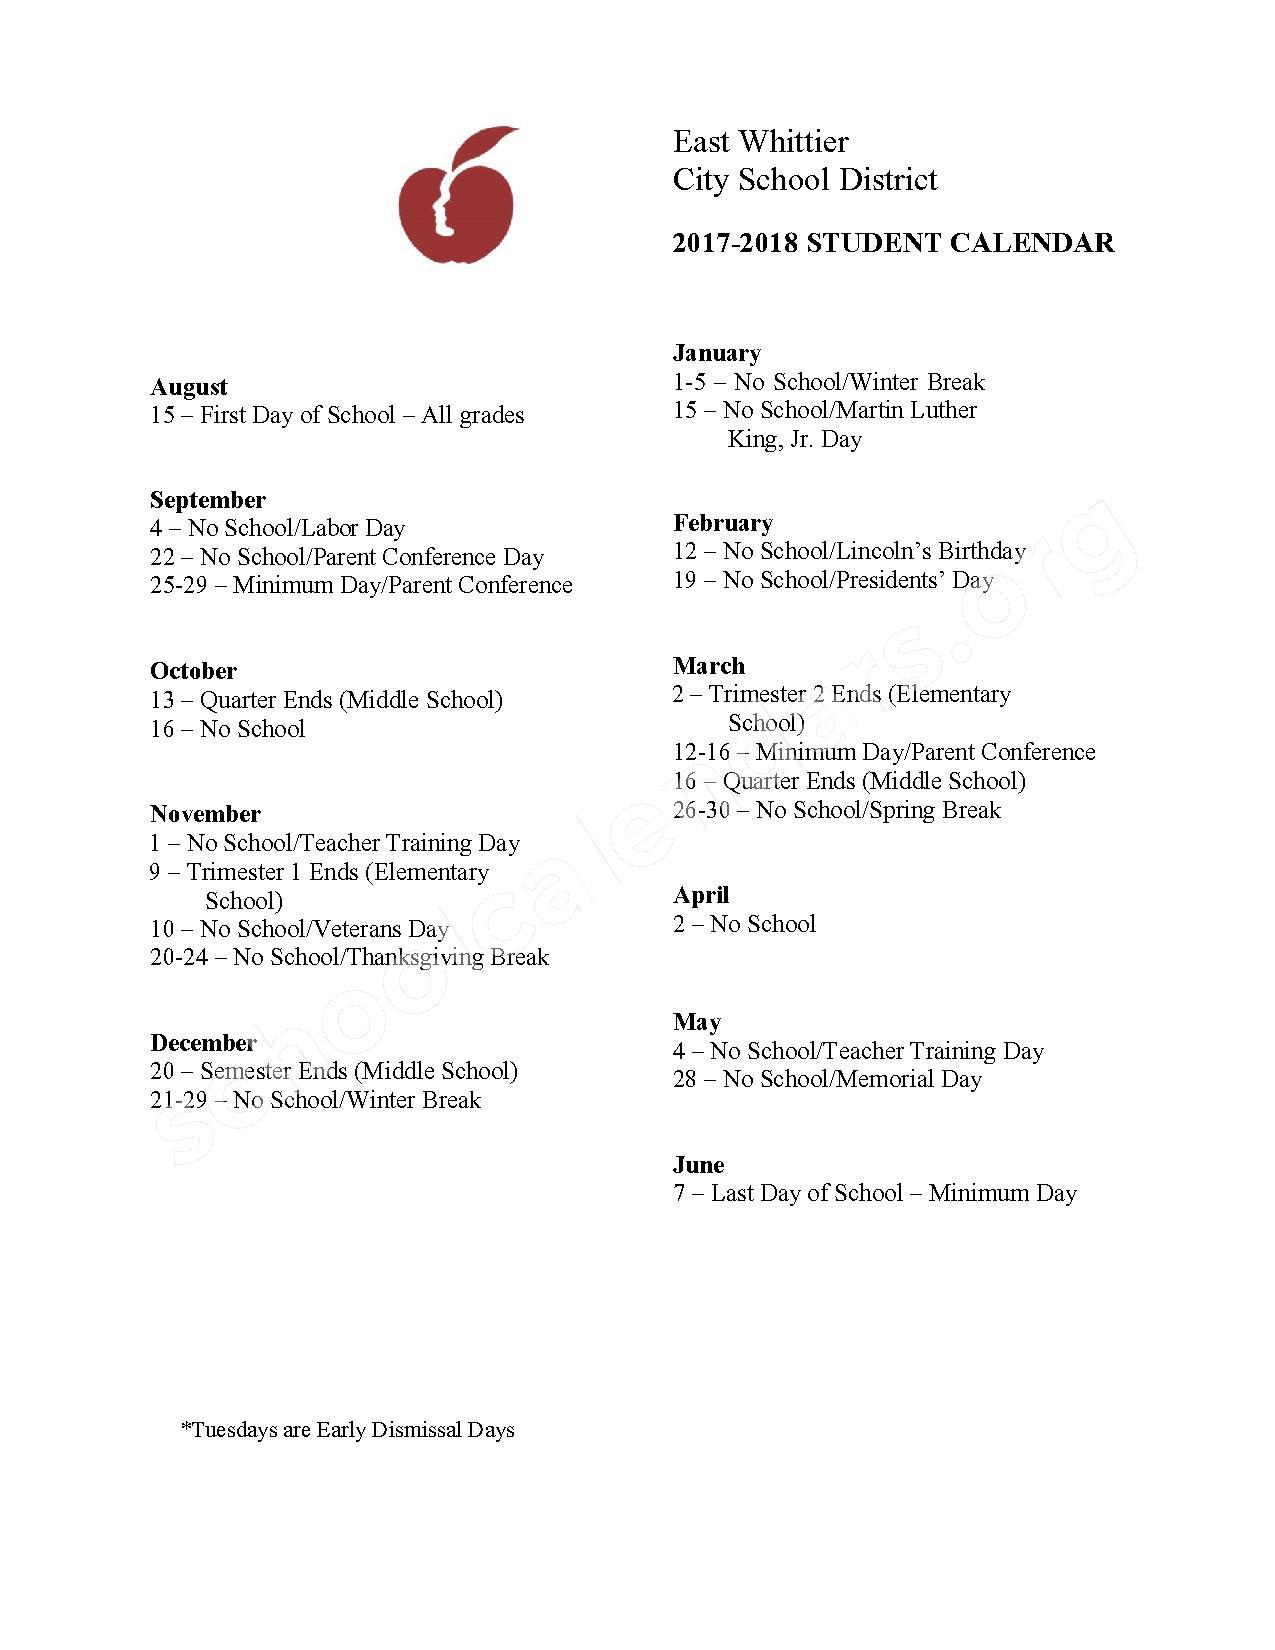 2016 - 2017  District Calendar – Scott Avenue Elementary School – page 2